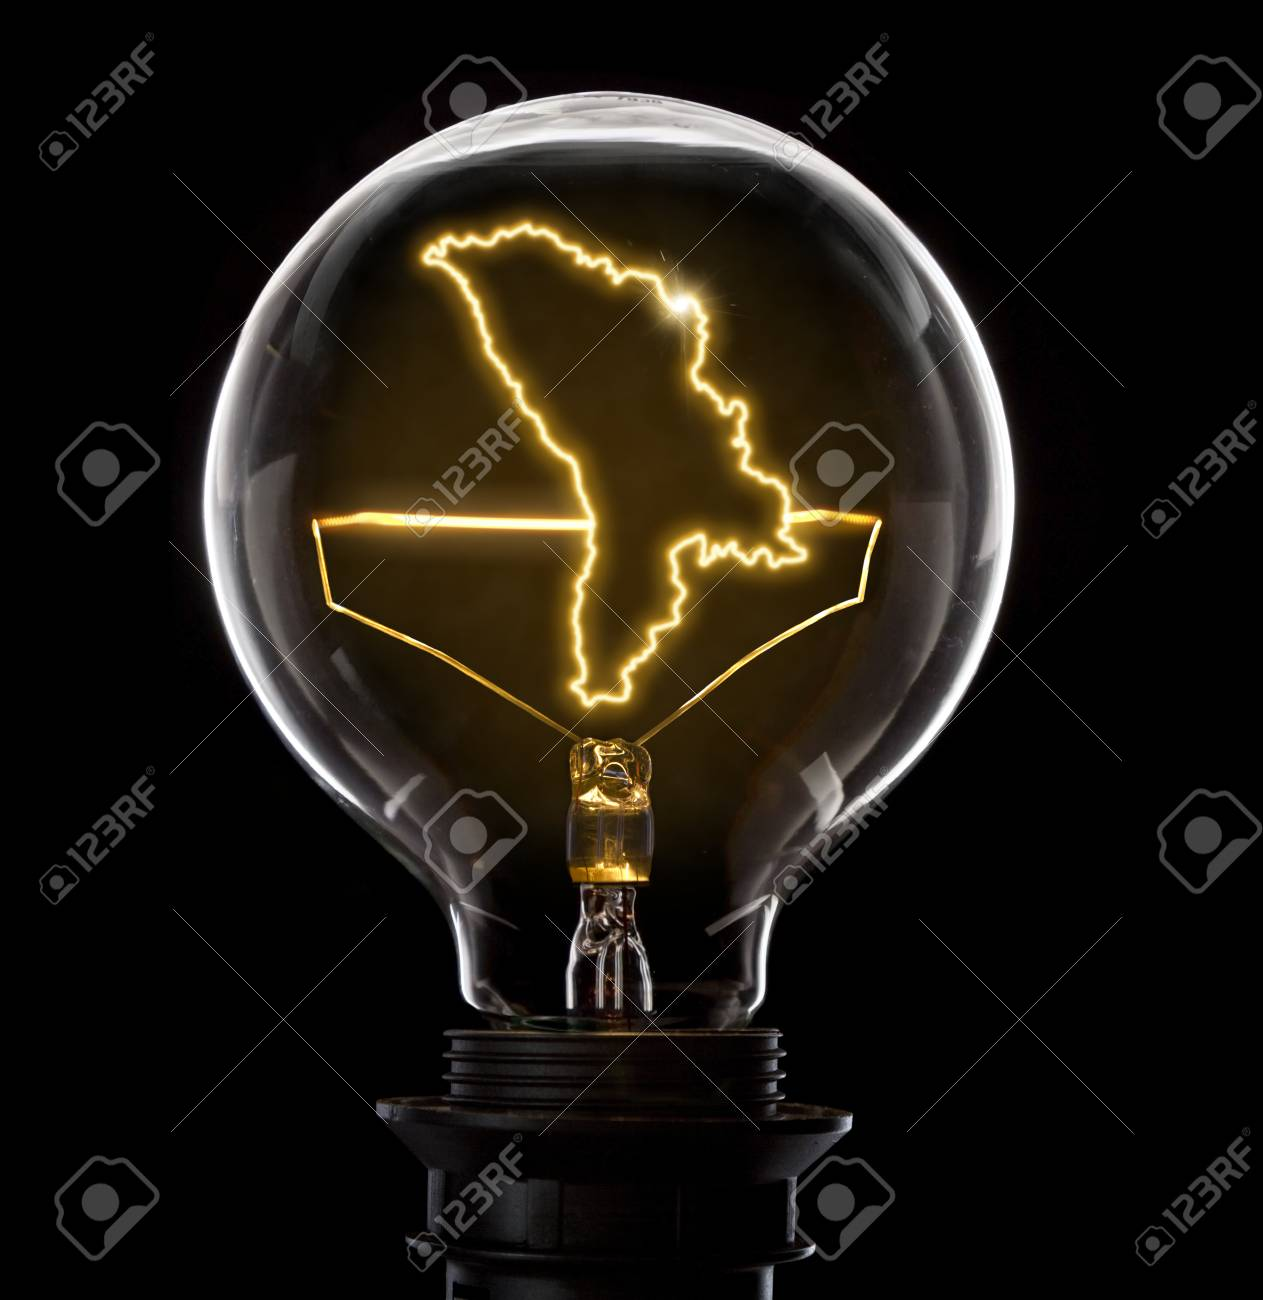 Fein Cobra Draht Plano Texas Fotos - Elektrische Schaltplan-Ideen ...